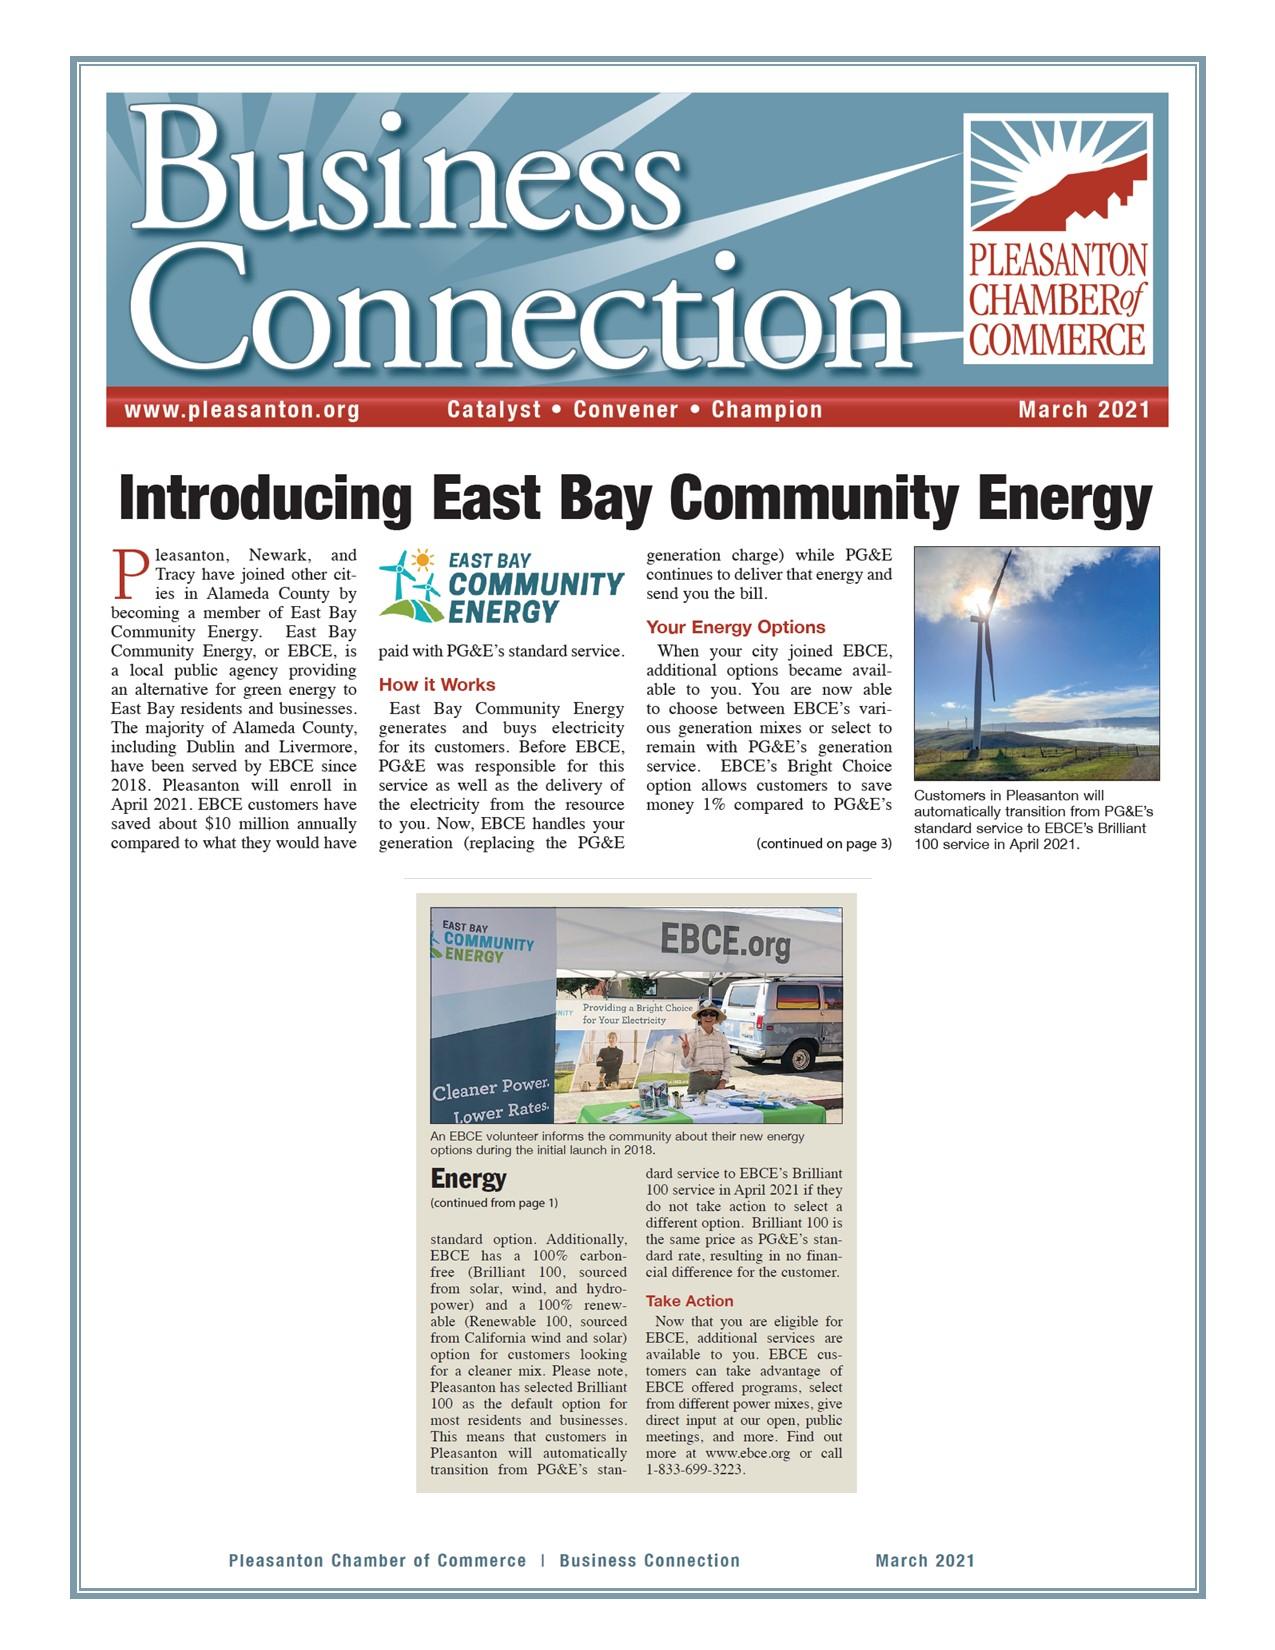 East Bay Community Energy Spotlight